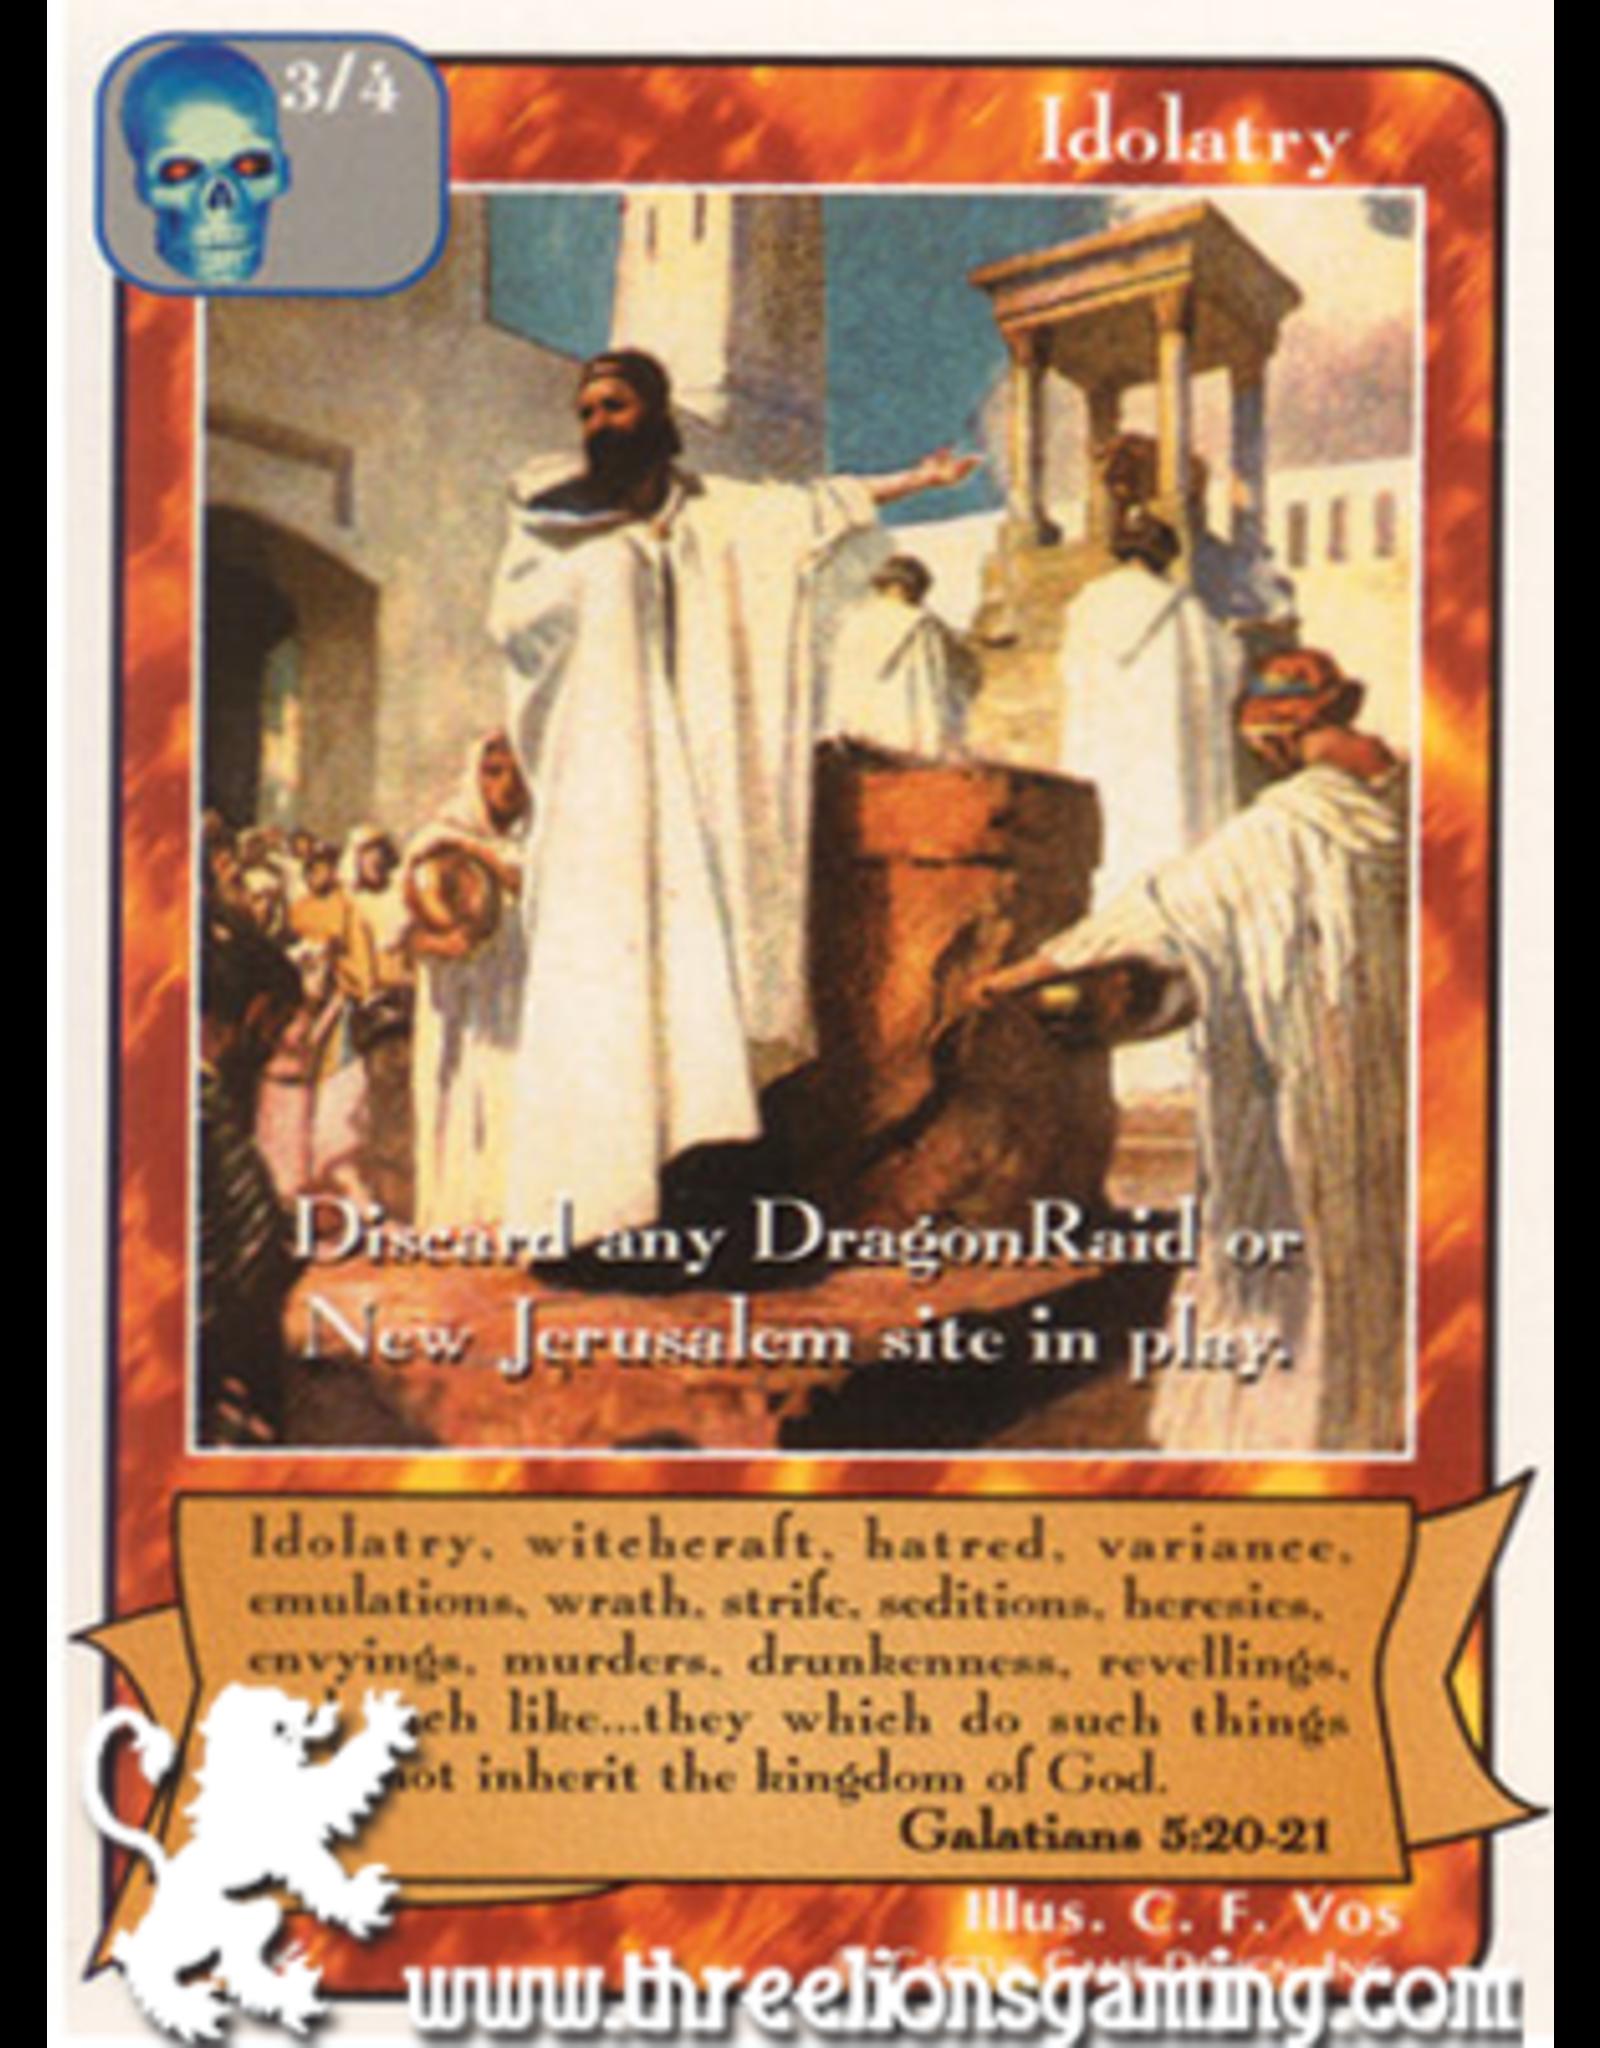 Ap: Idolatry